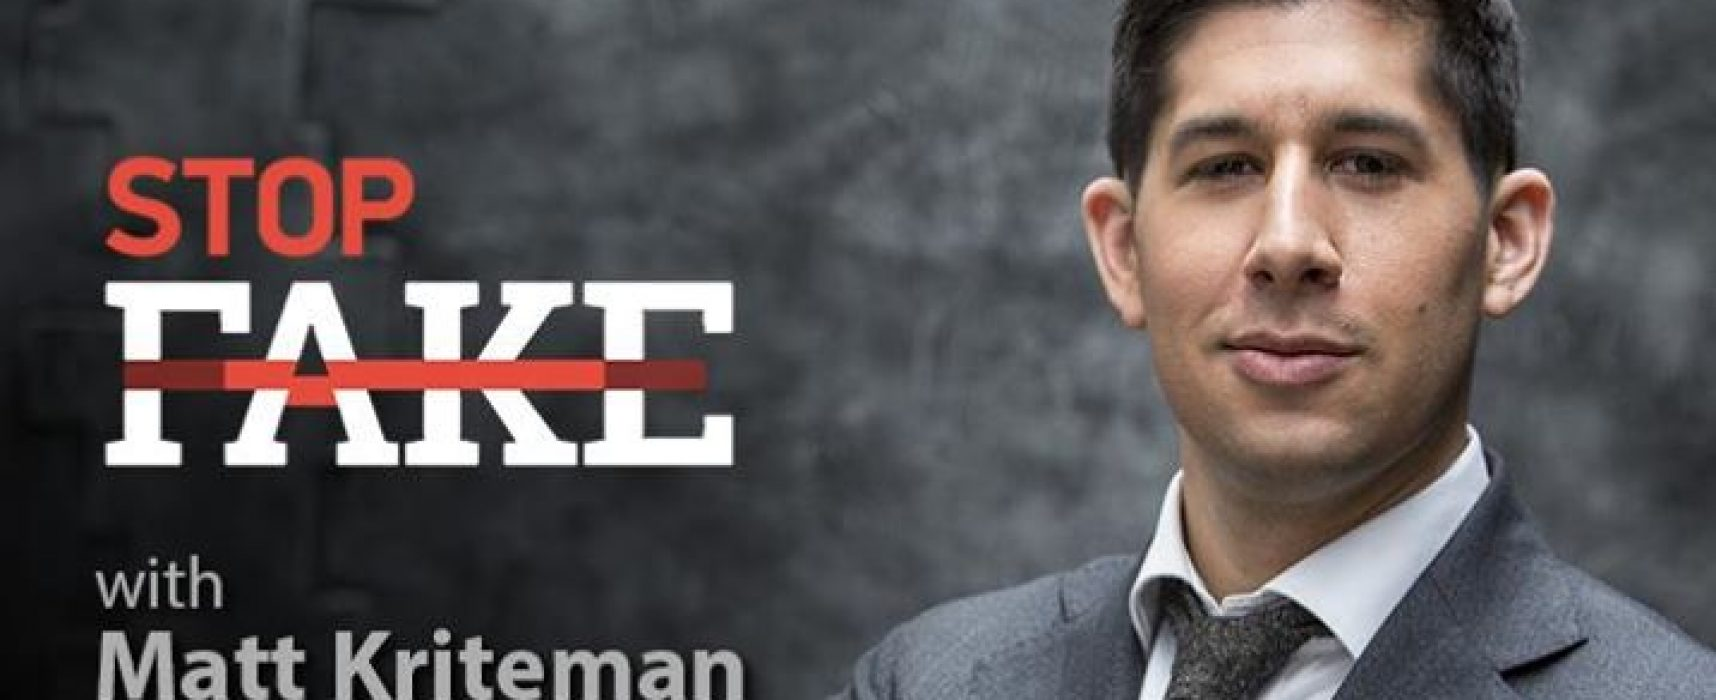 StopFakeNews #124 with Matt Kriteman